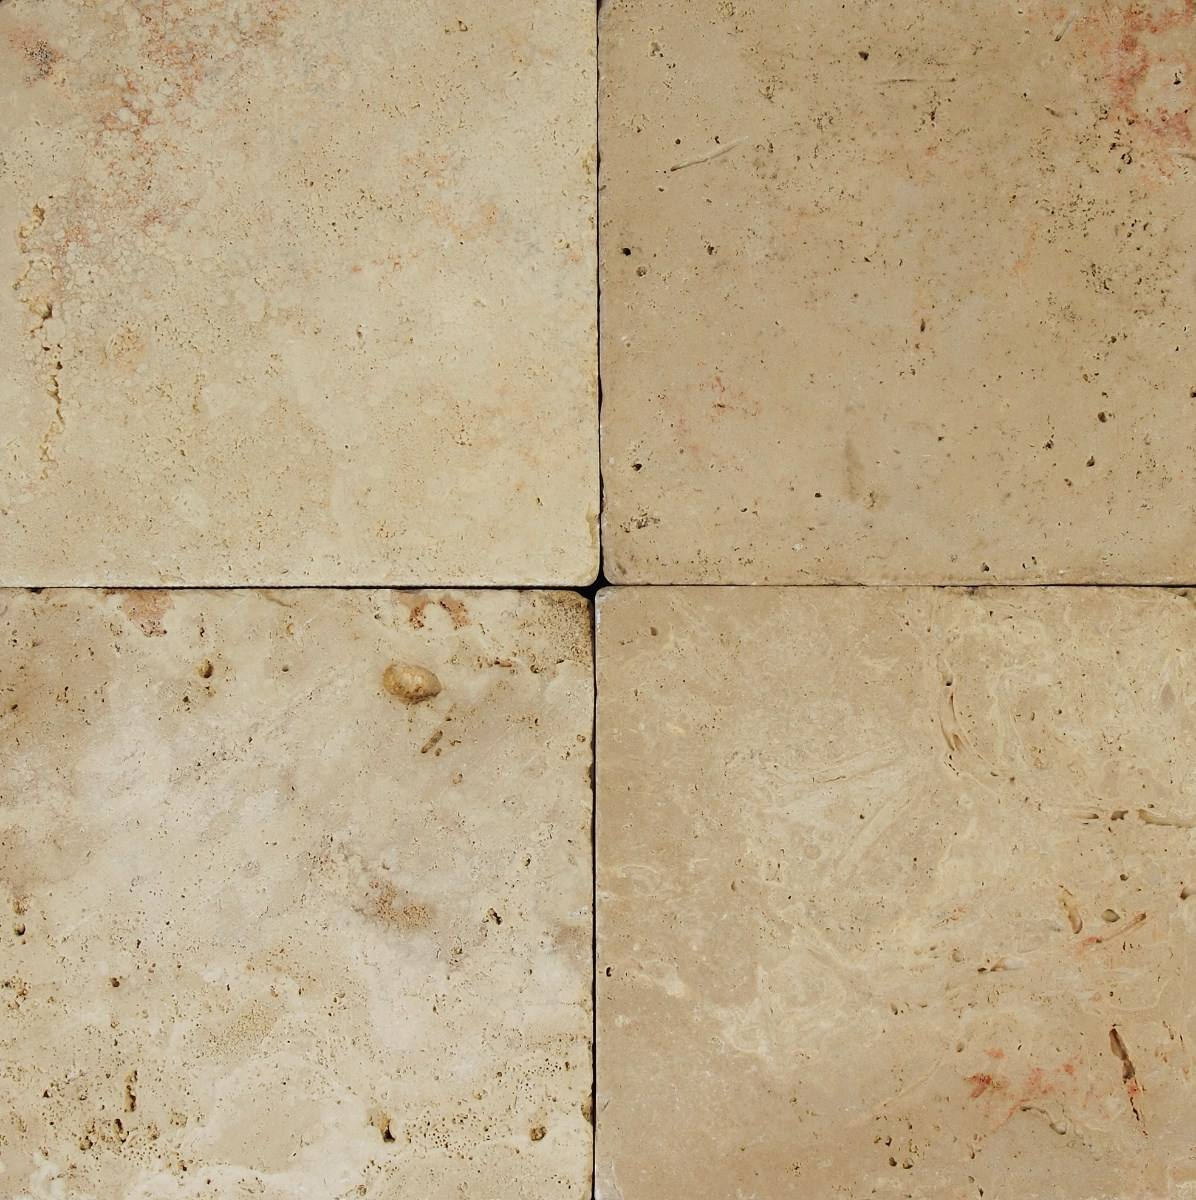 Marmol travertino tomboleado 190 00 m2 calidad primera for Marmol de travertino